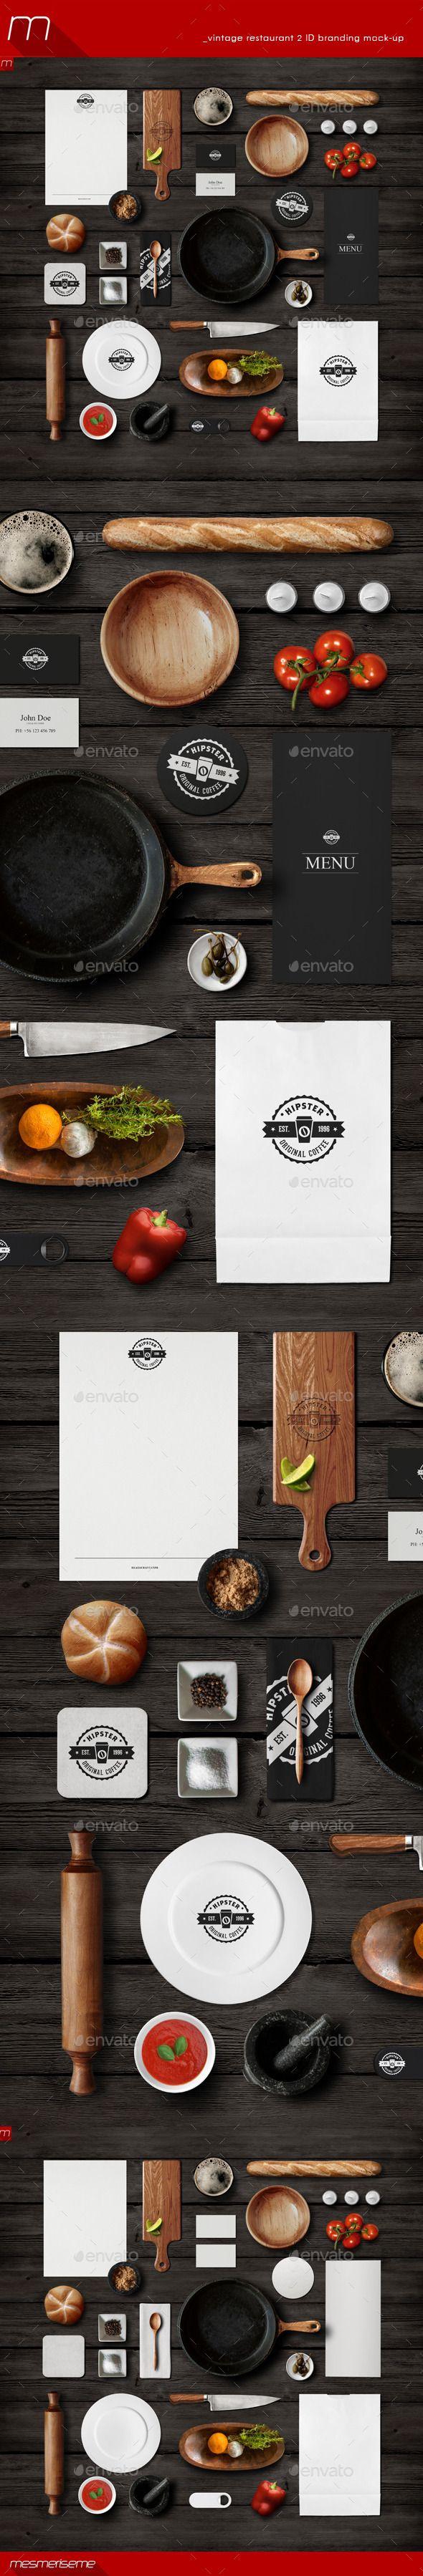 Vintage Restaurant 2 Identity Branding Mock-up - Miscellaneous Product Mock-Ups